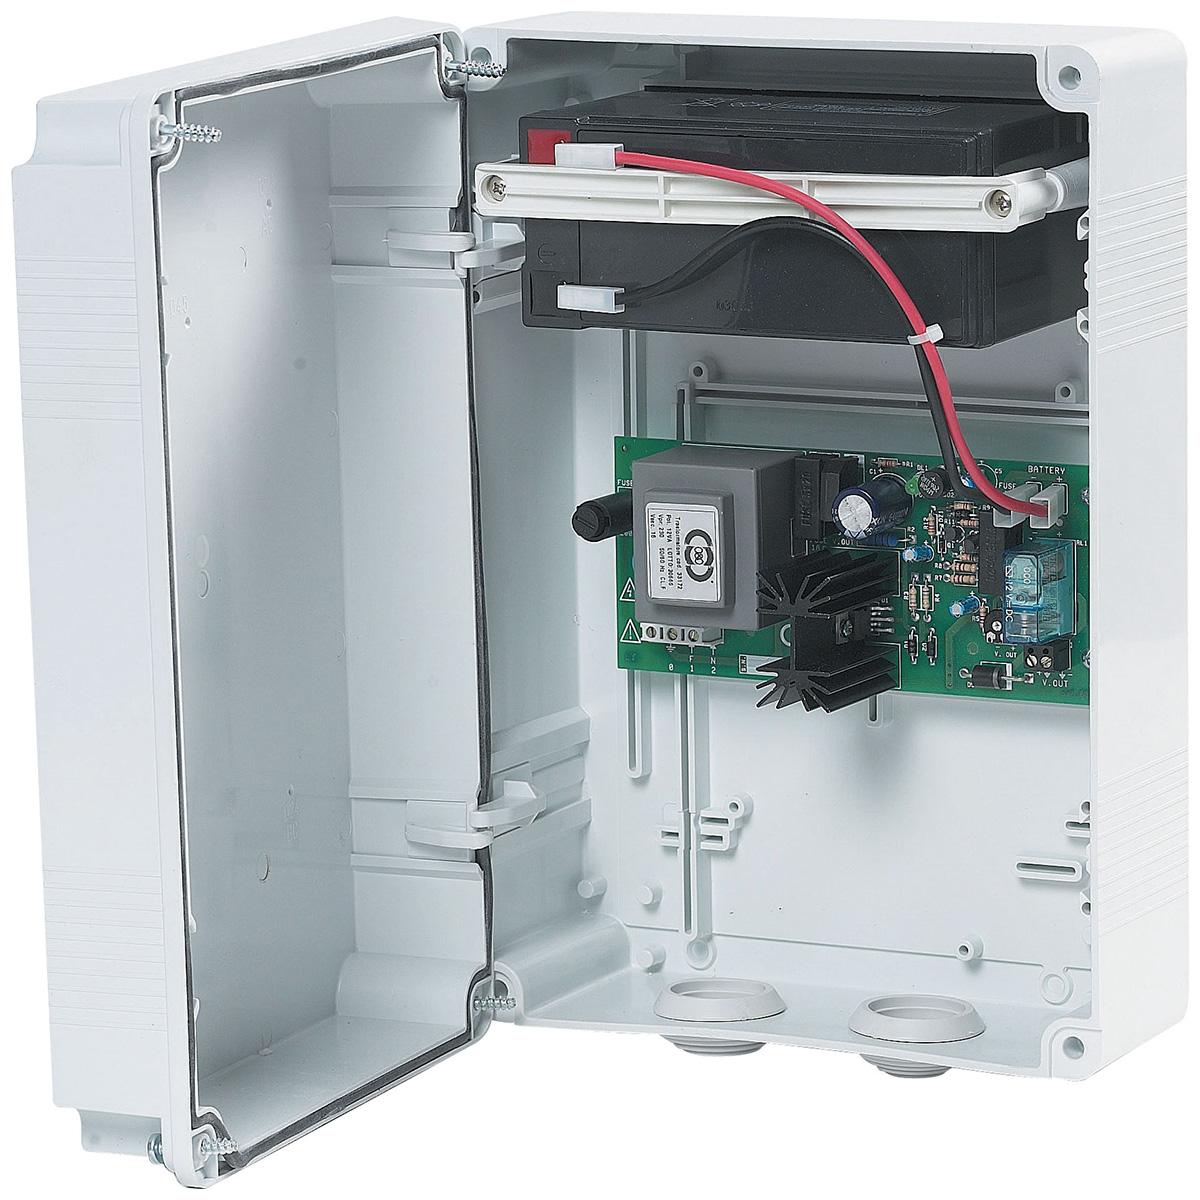 BFT BATT-EB Pufferbatterie